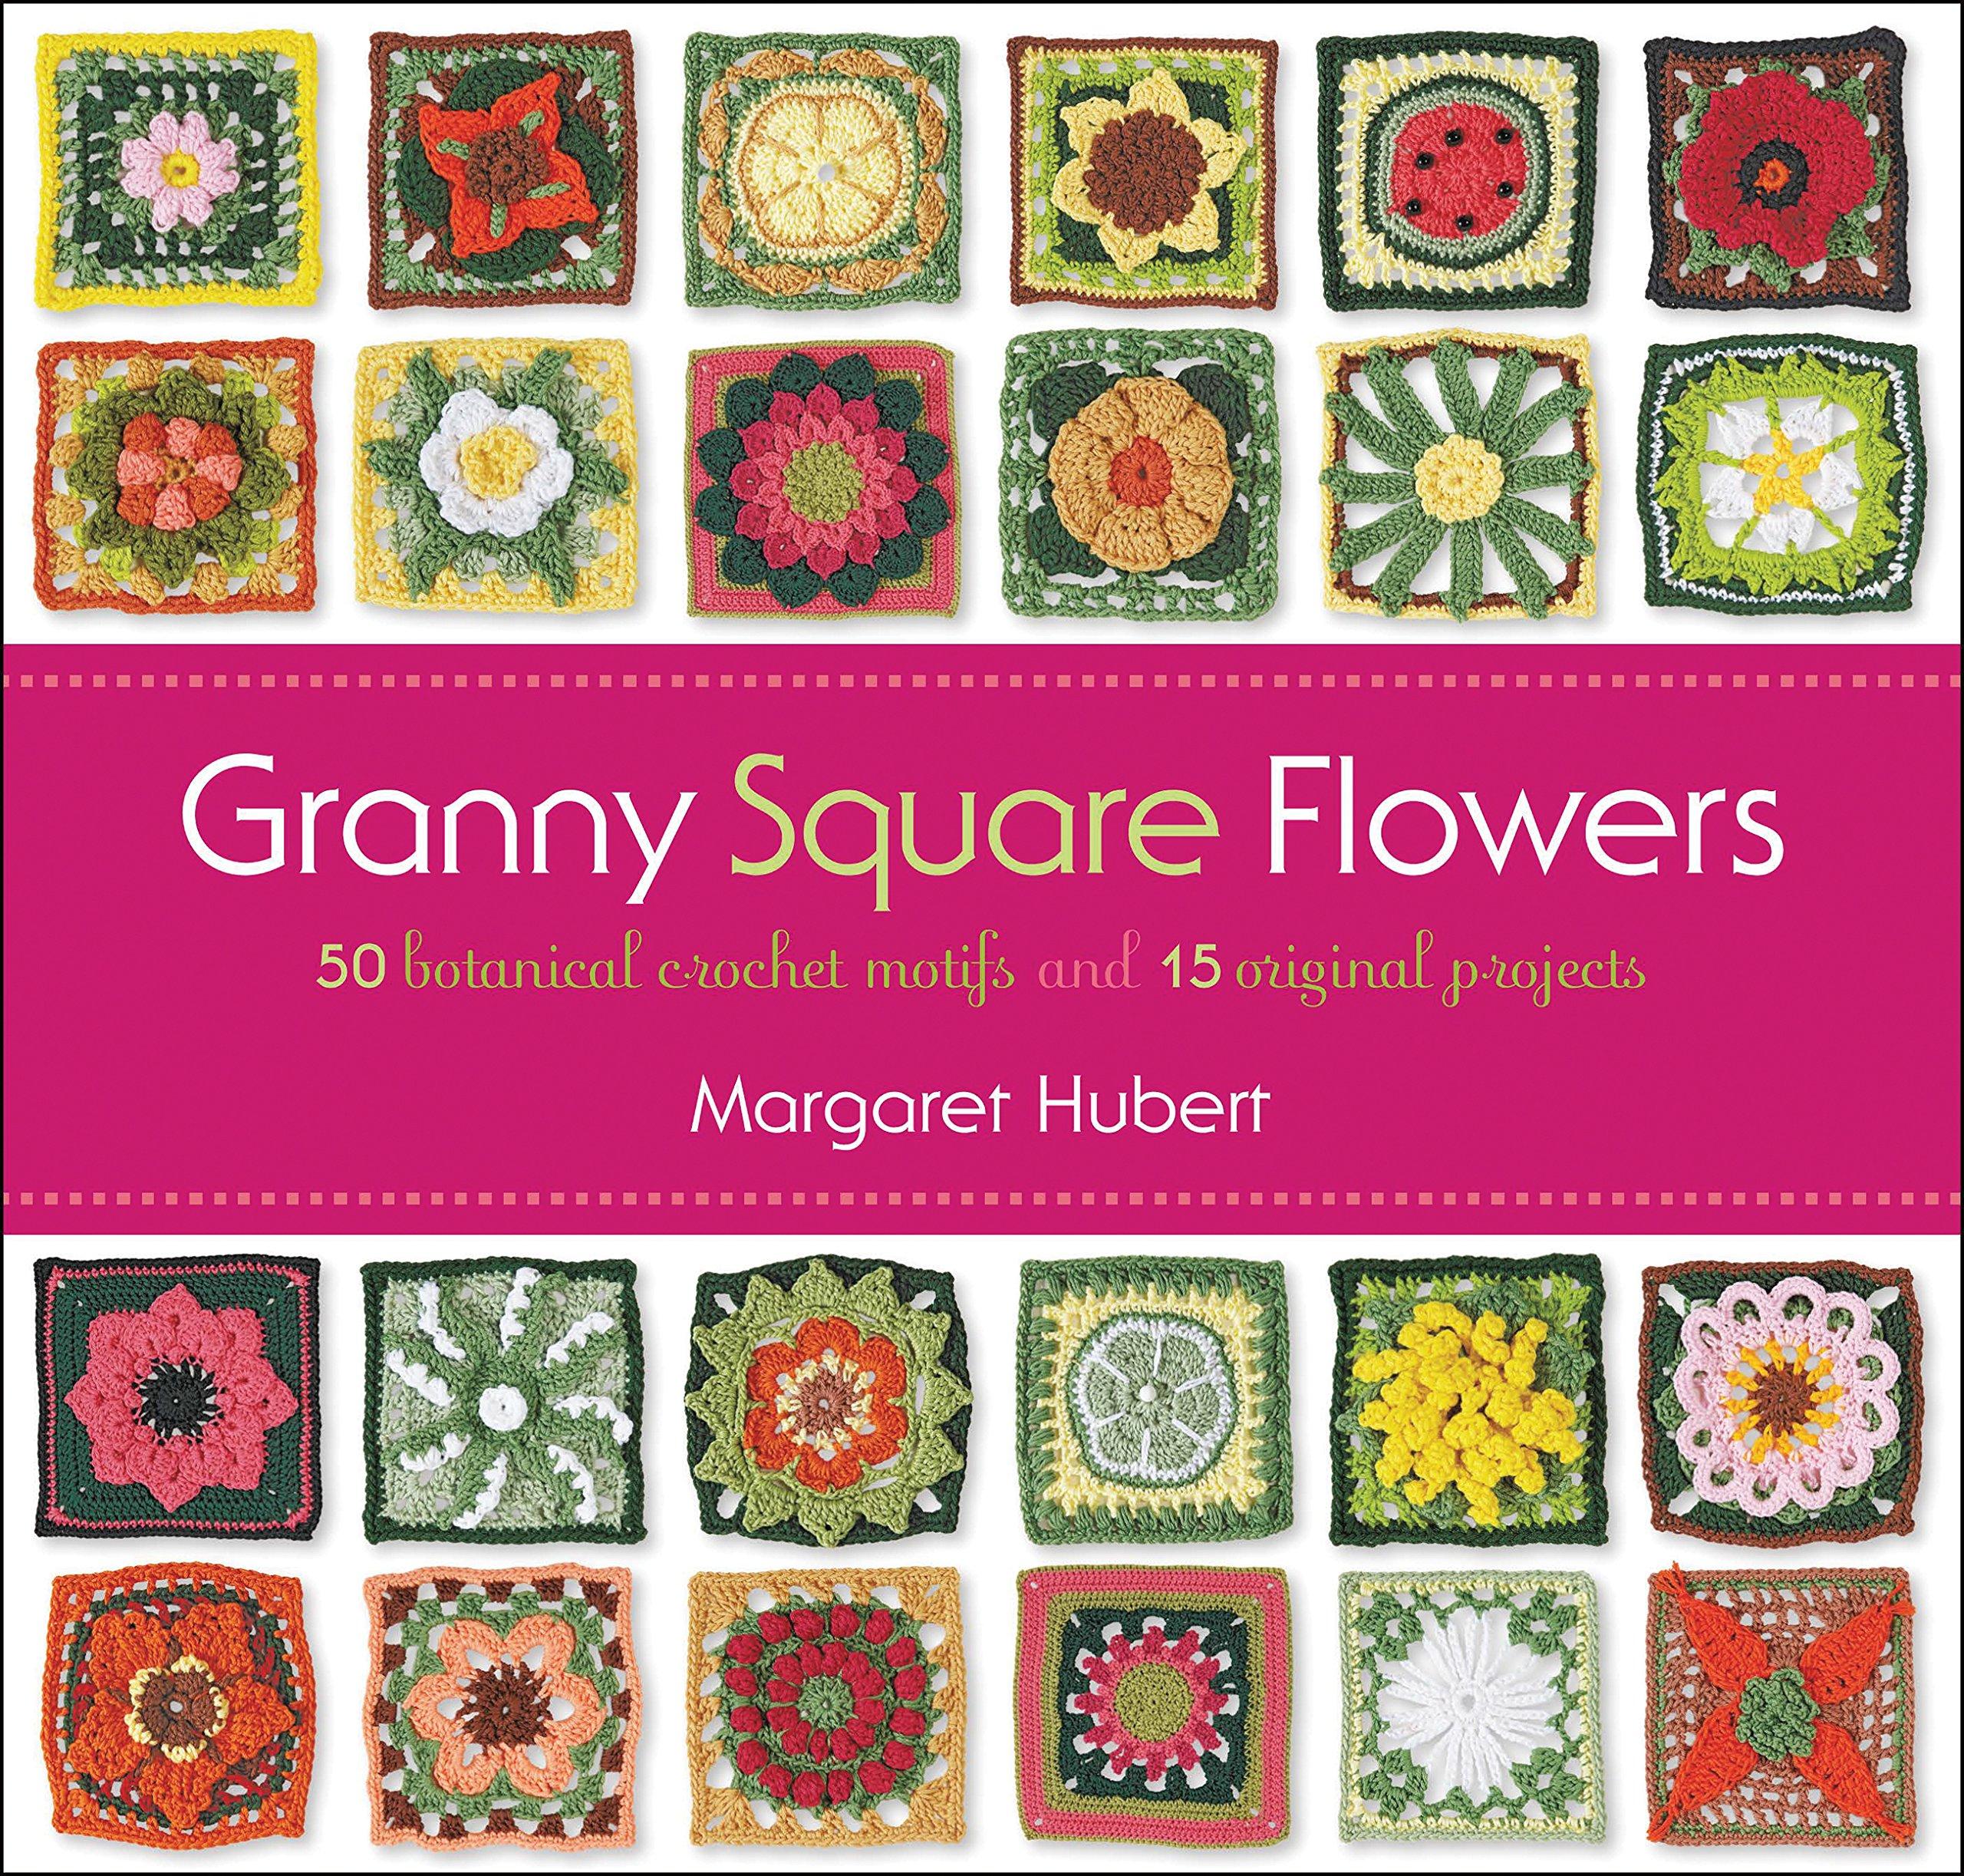 Granny Square Flowers 50 Botanical Crochet Motifs And 15 Original